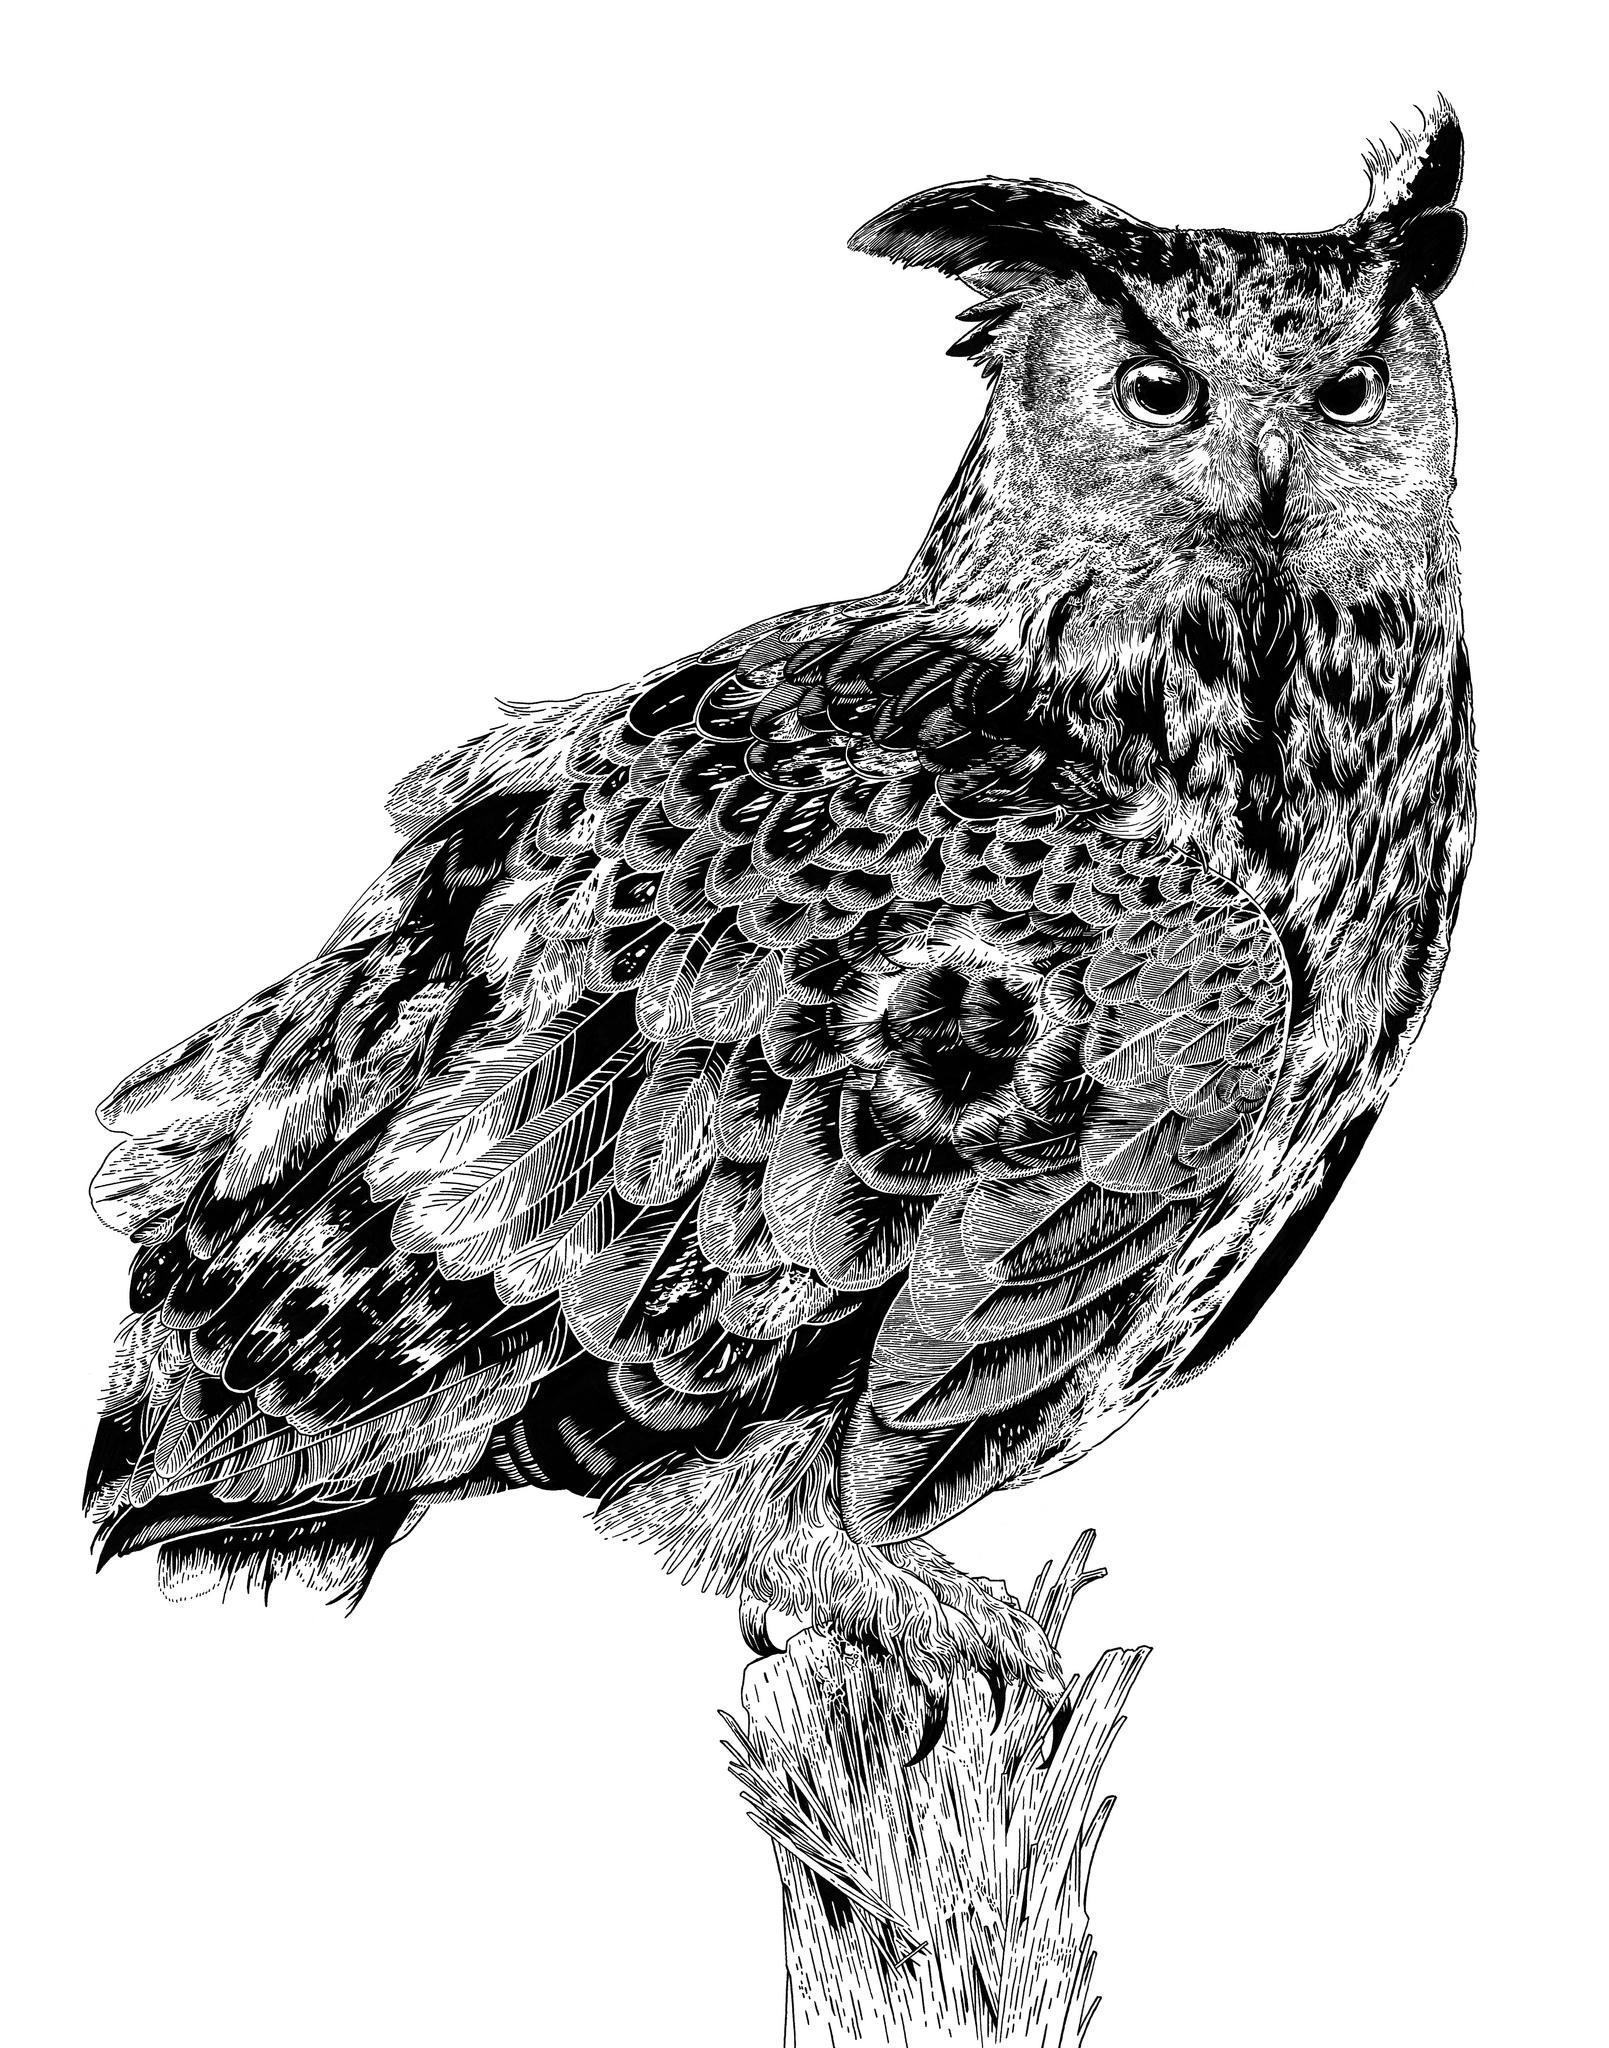 Owl by rghayati